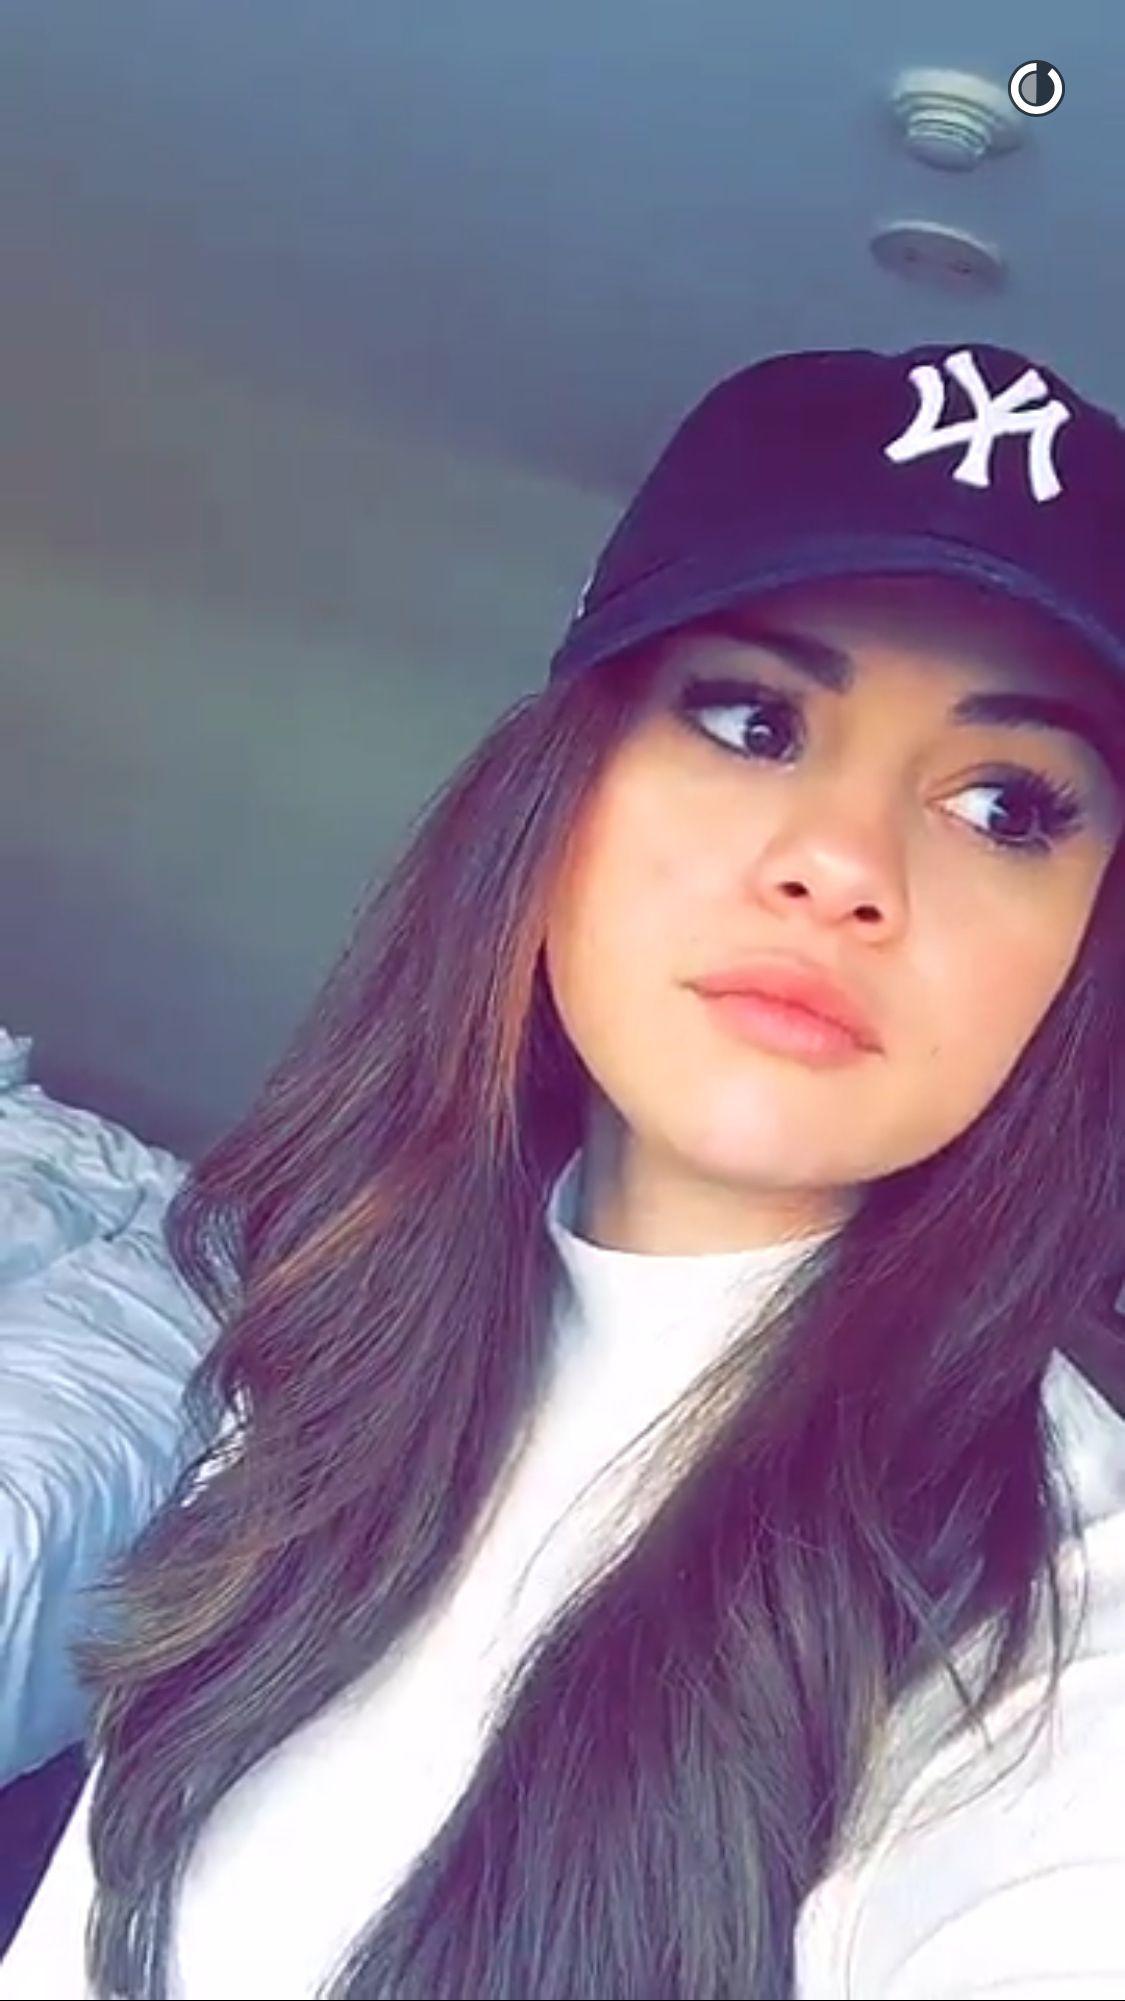 Selena No Snap Selena Gomez Pinterest Selena Selena Gomez